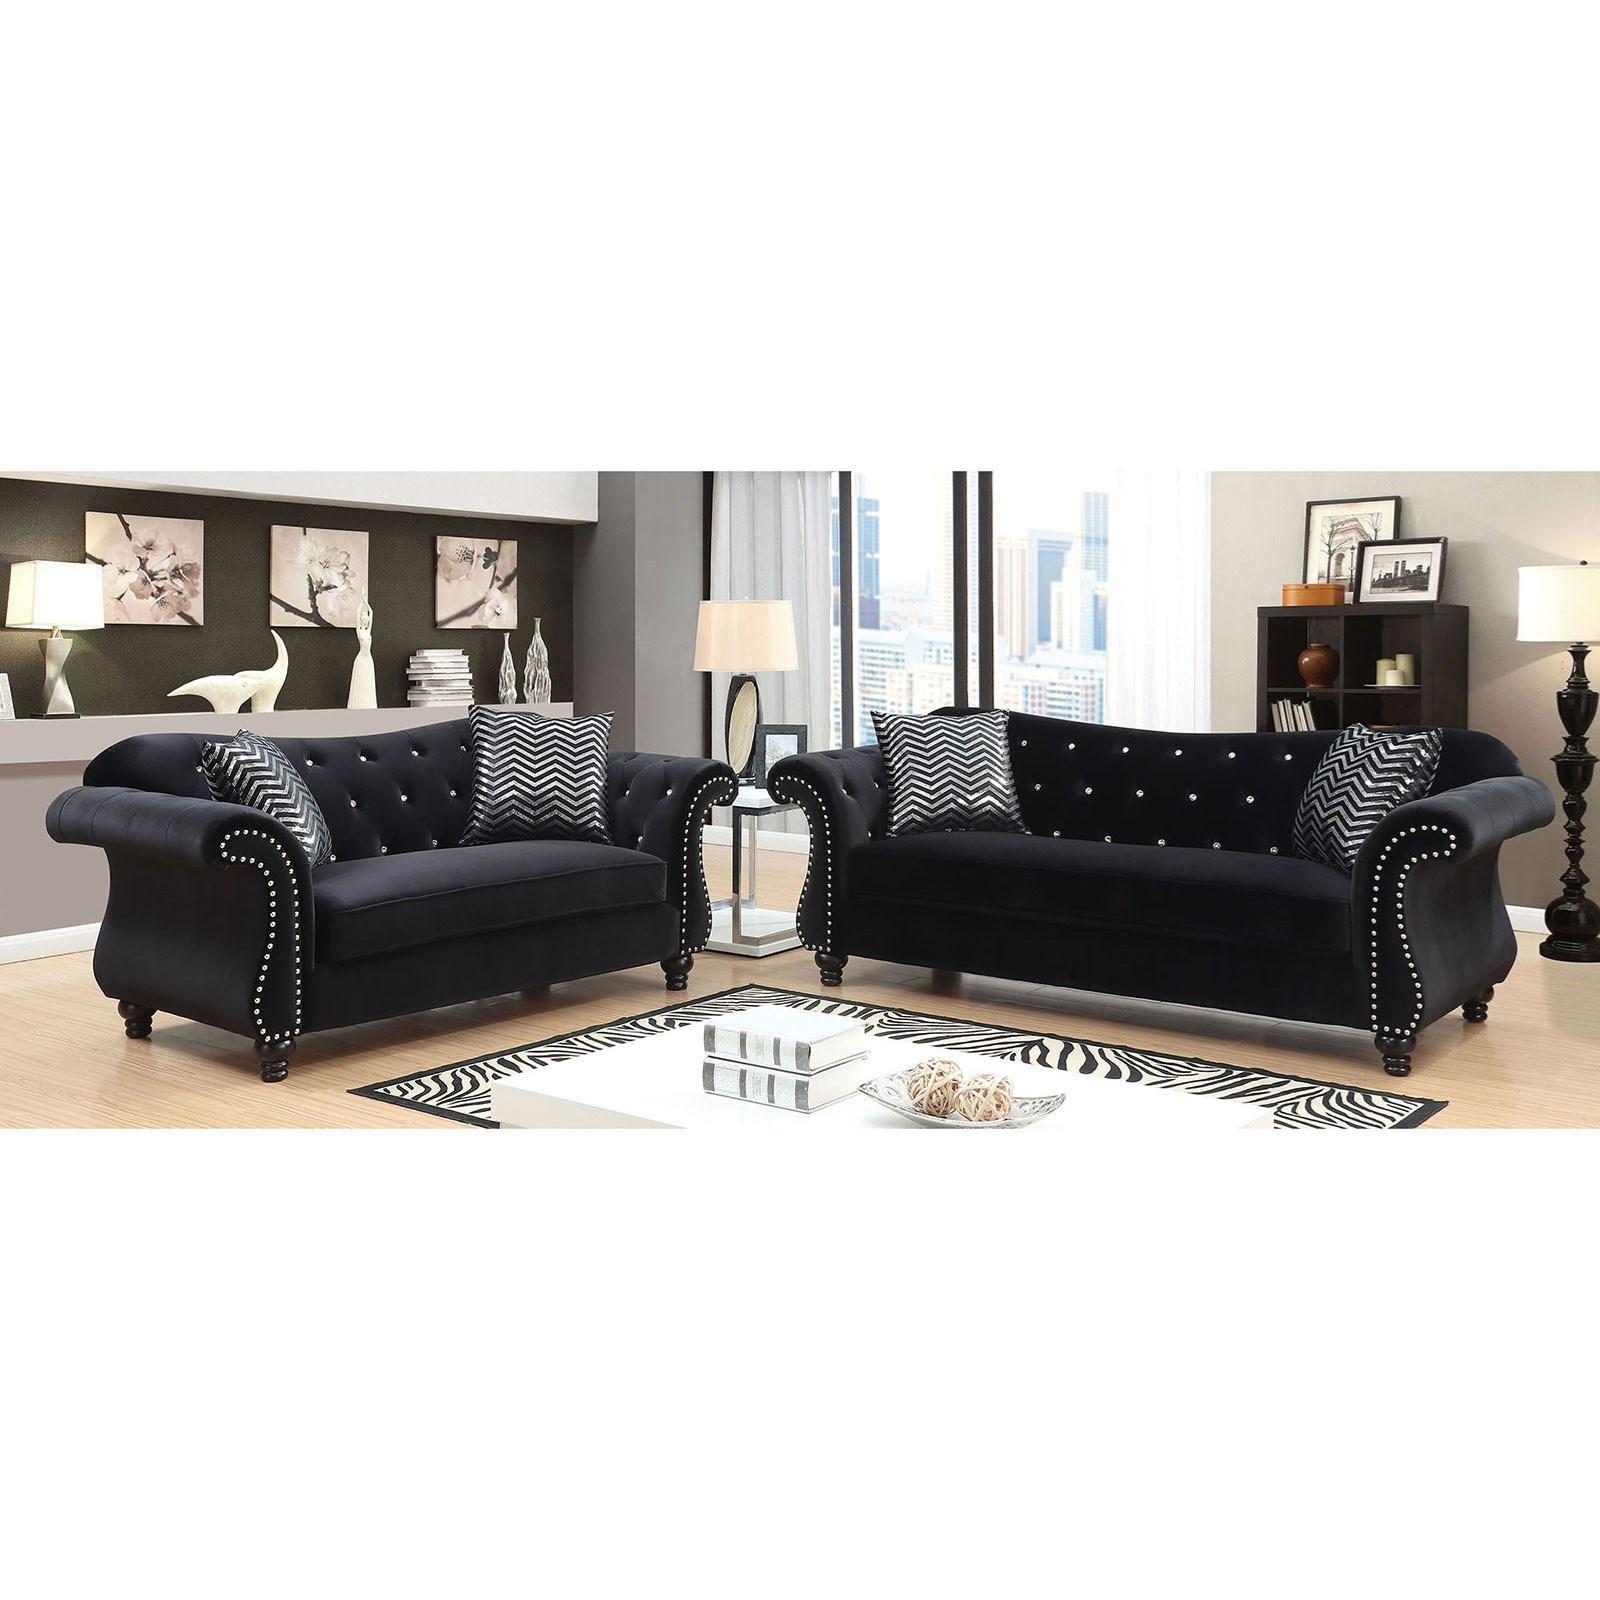 Jolanda Stationary Living Room Group at Household Furniture